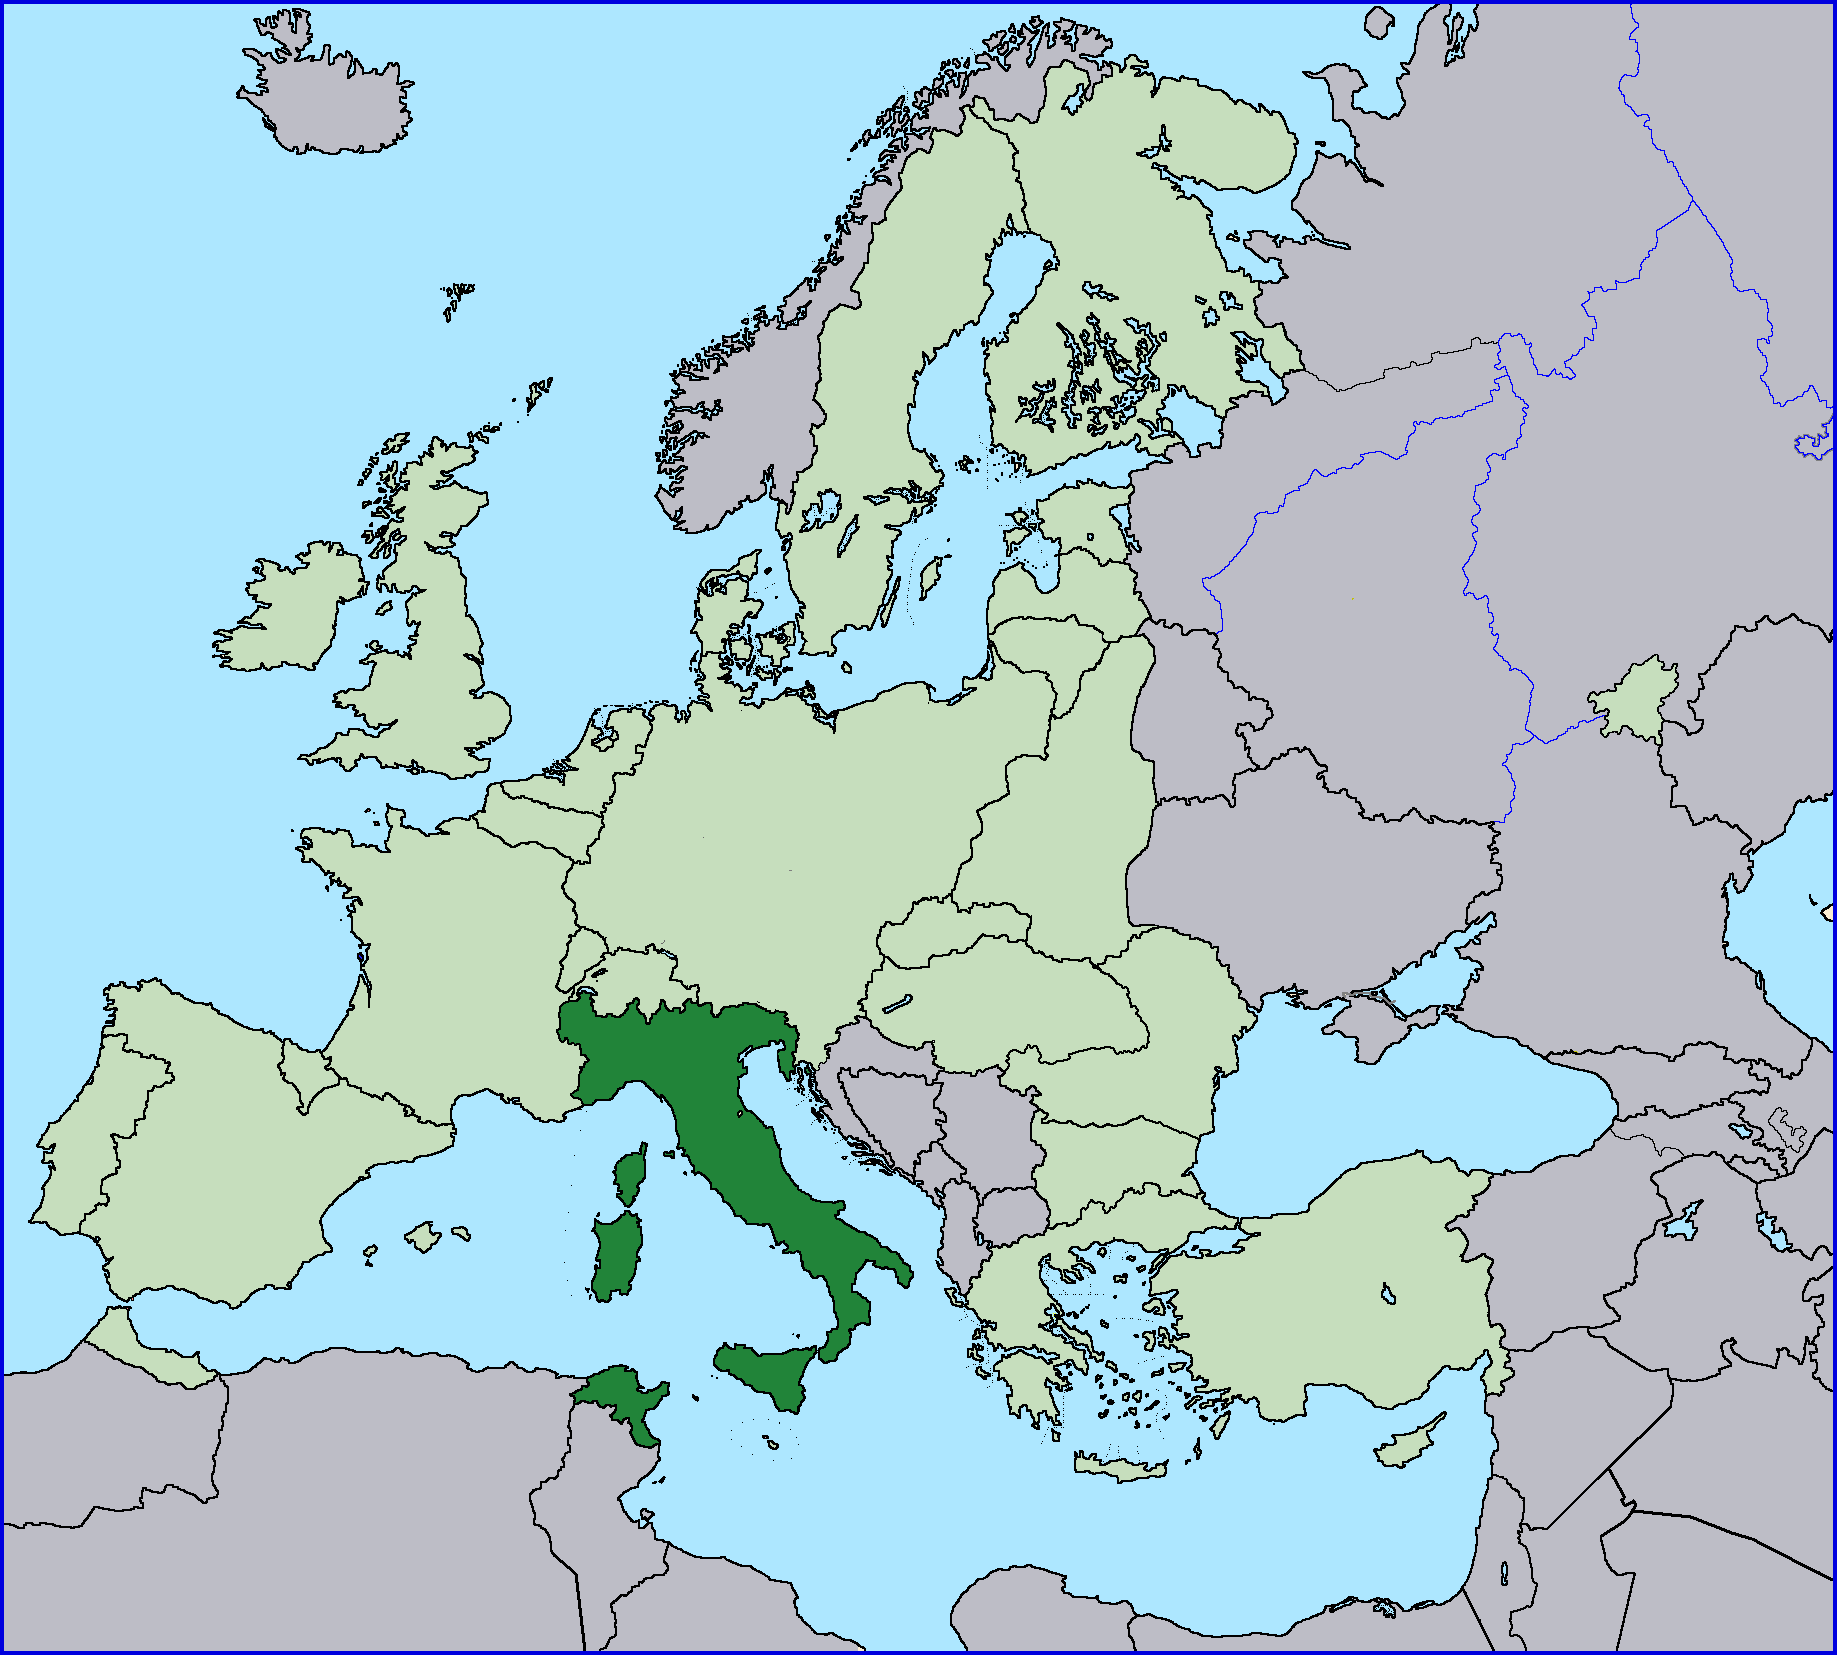 image location italy eu europe png alternative history fandom